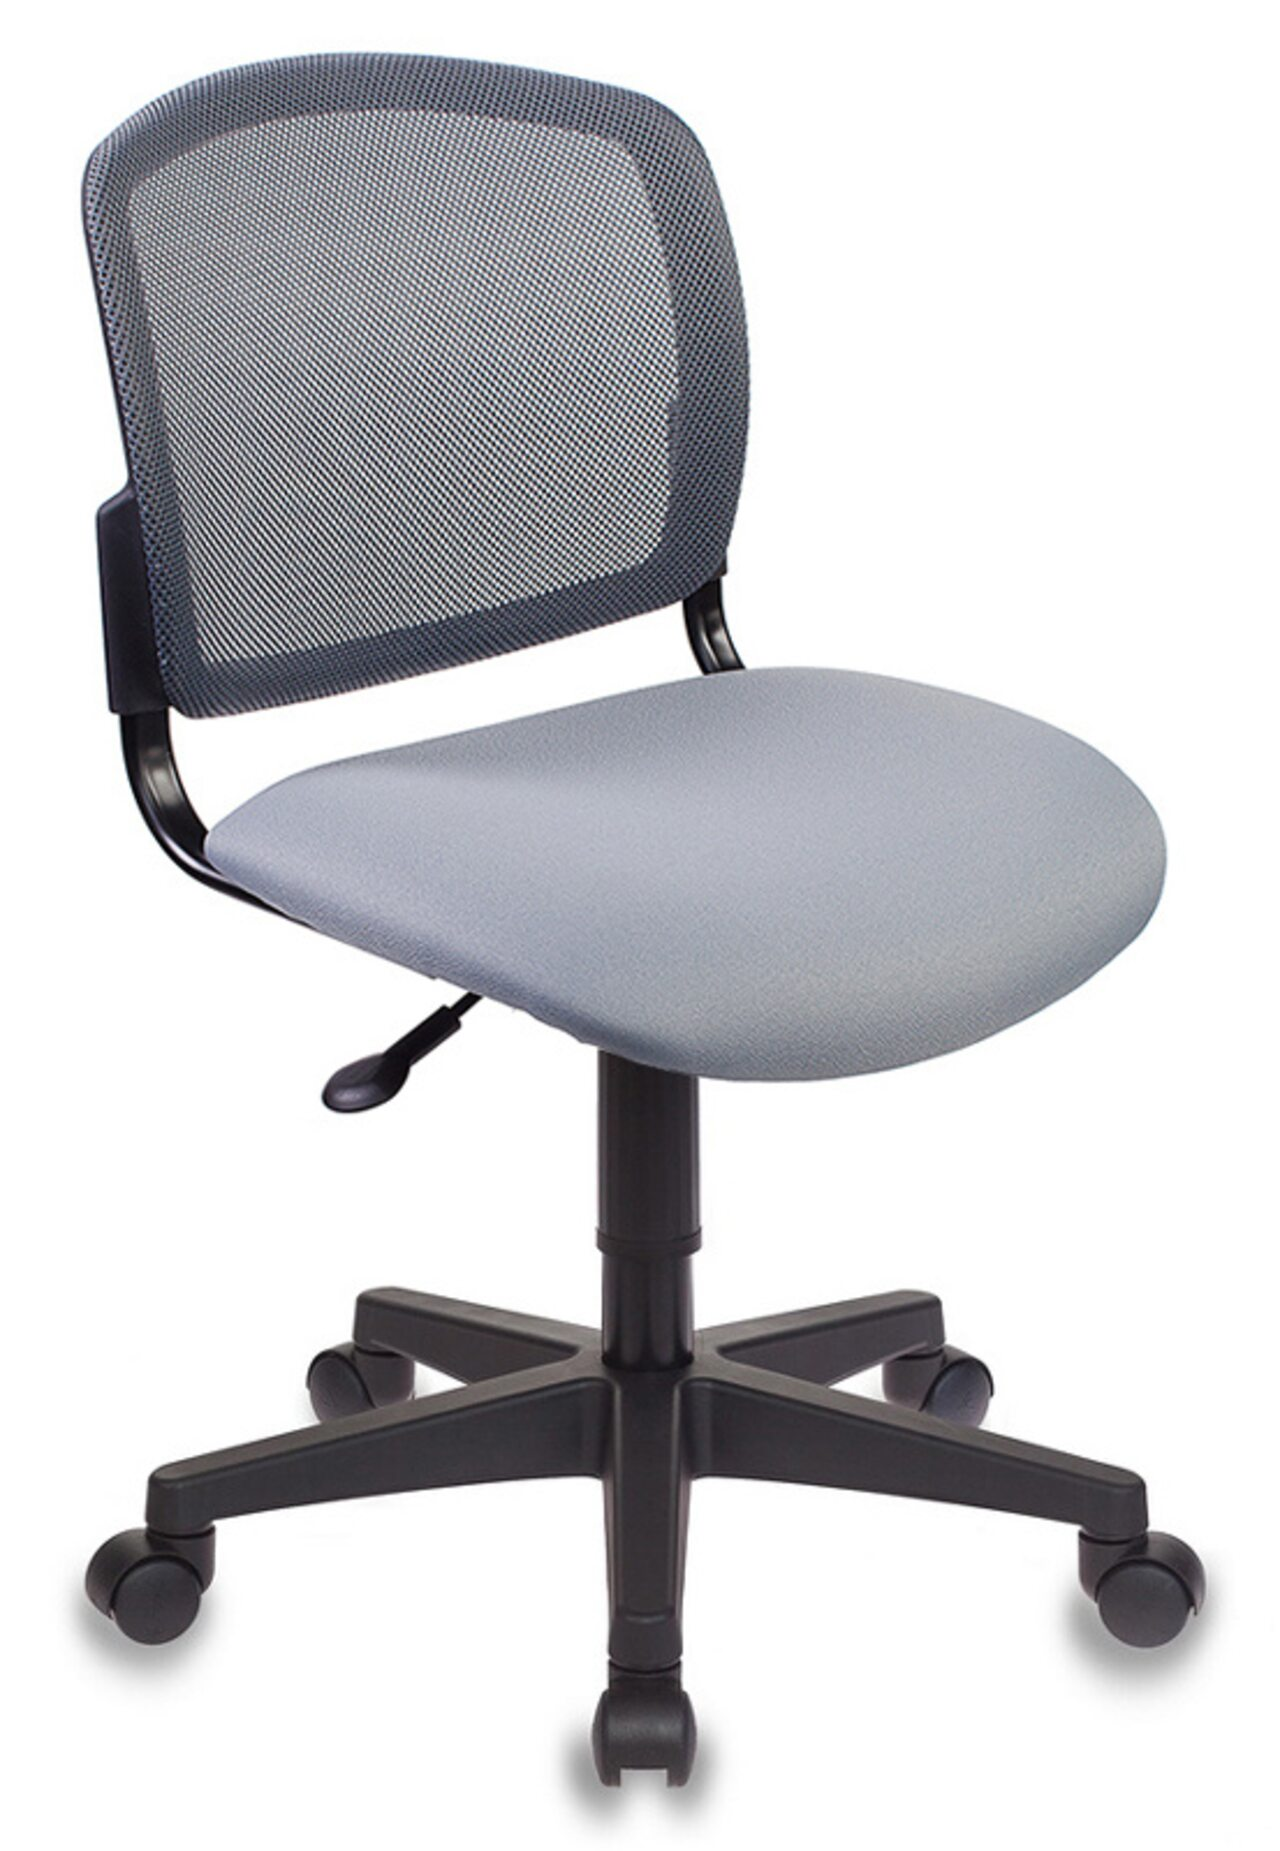 Кресло для персонала CH-296/BL/15-10 - фото 9